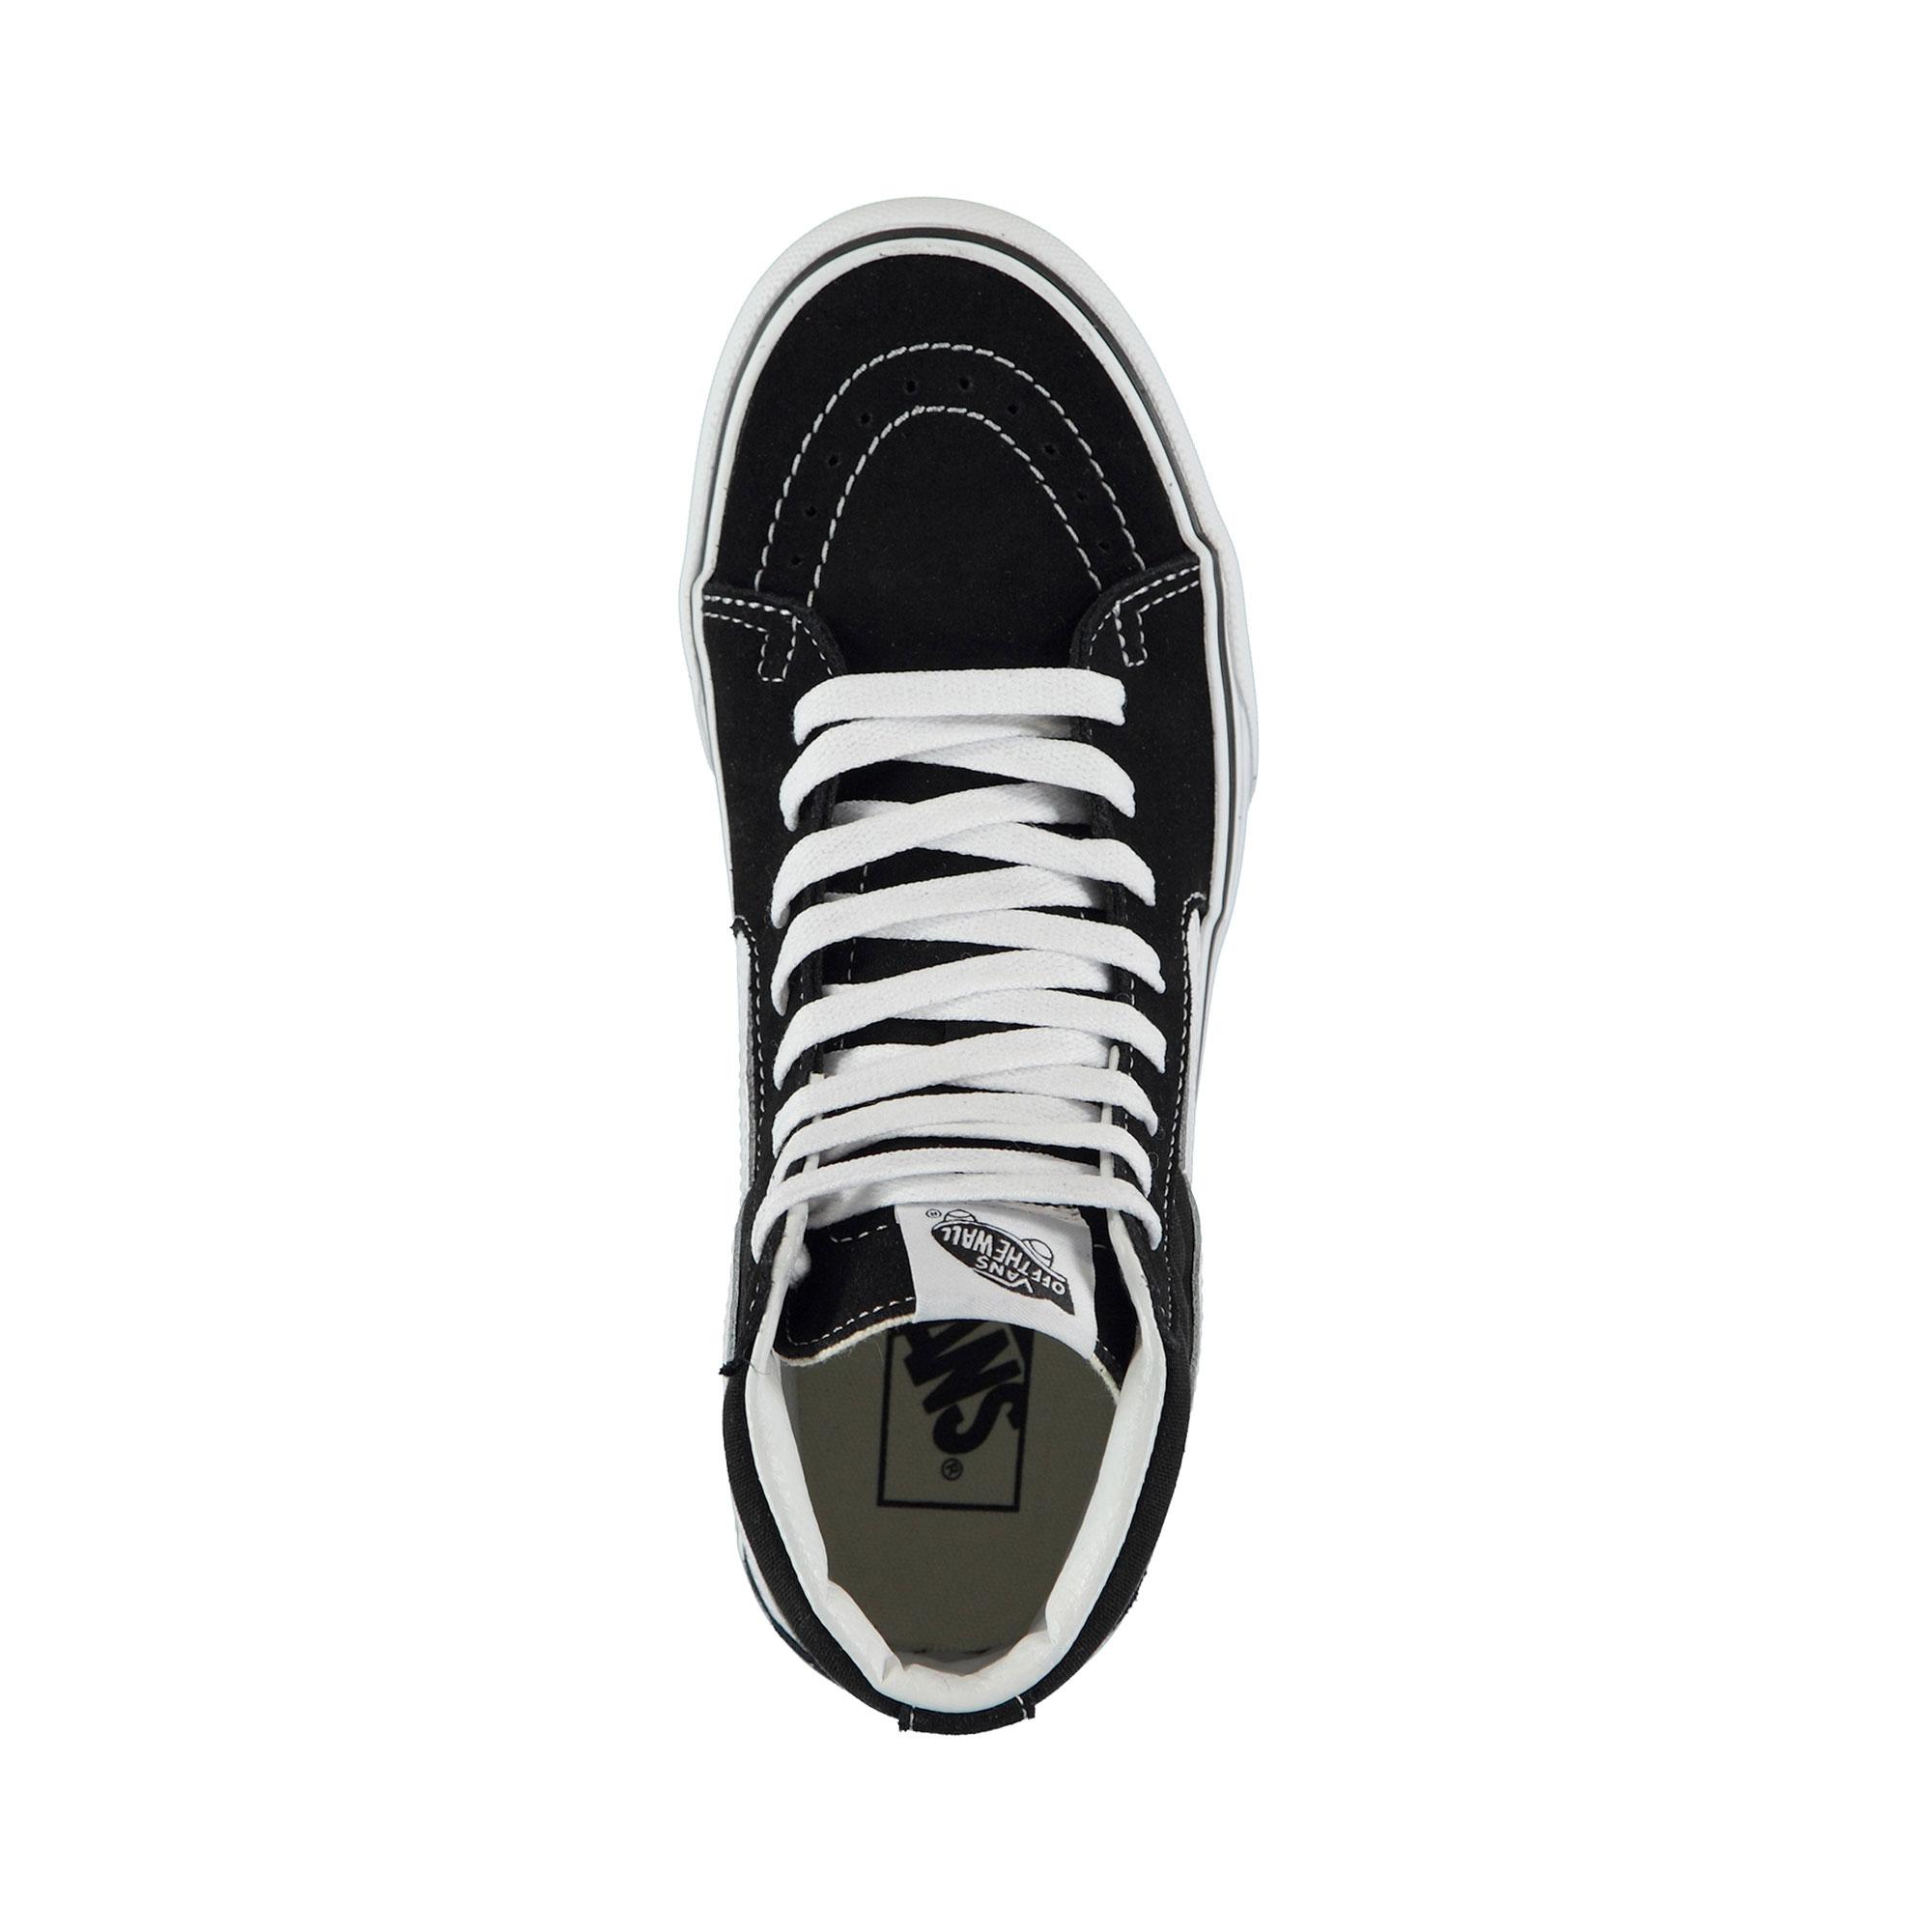 a753f5638d Vans SK8-Hi 46 MTE DX Siyah Erkek Sneaker Kadin Sneaker 3219082 ...